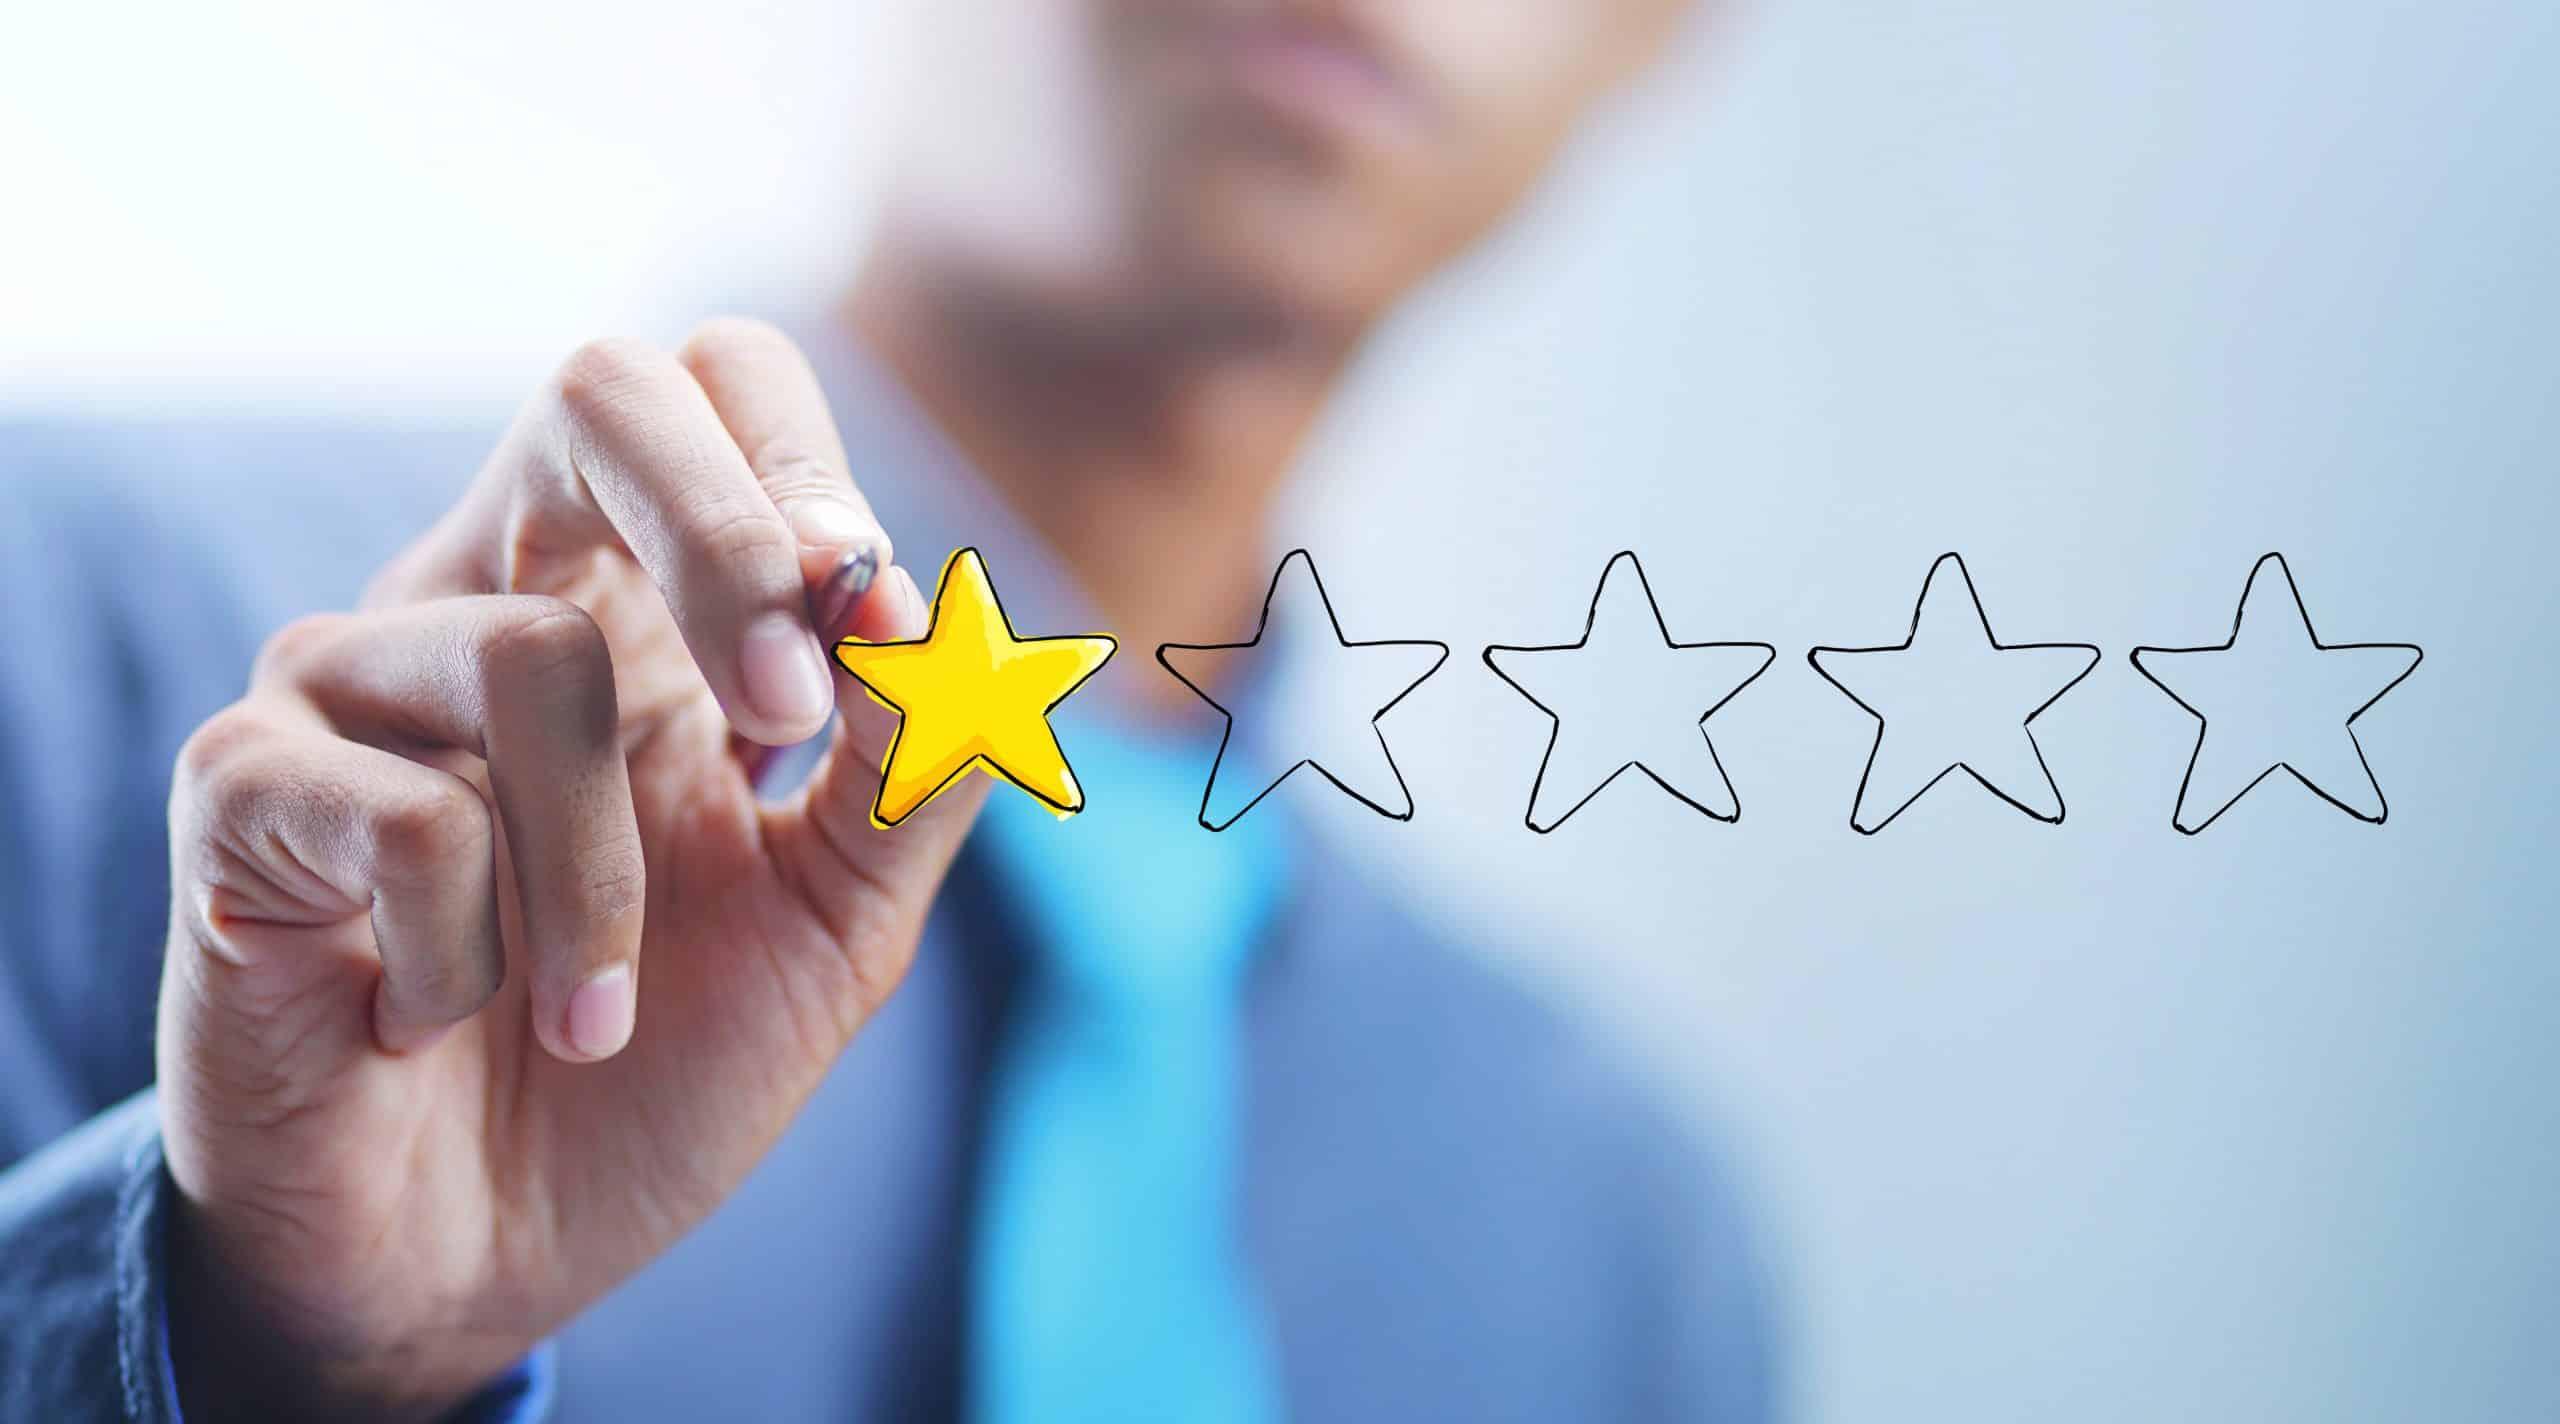 fix bad reviews scaled  fix bad reviews scaled